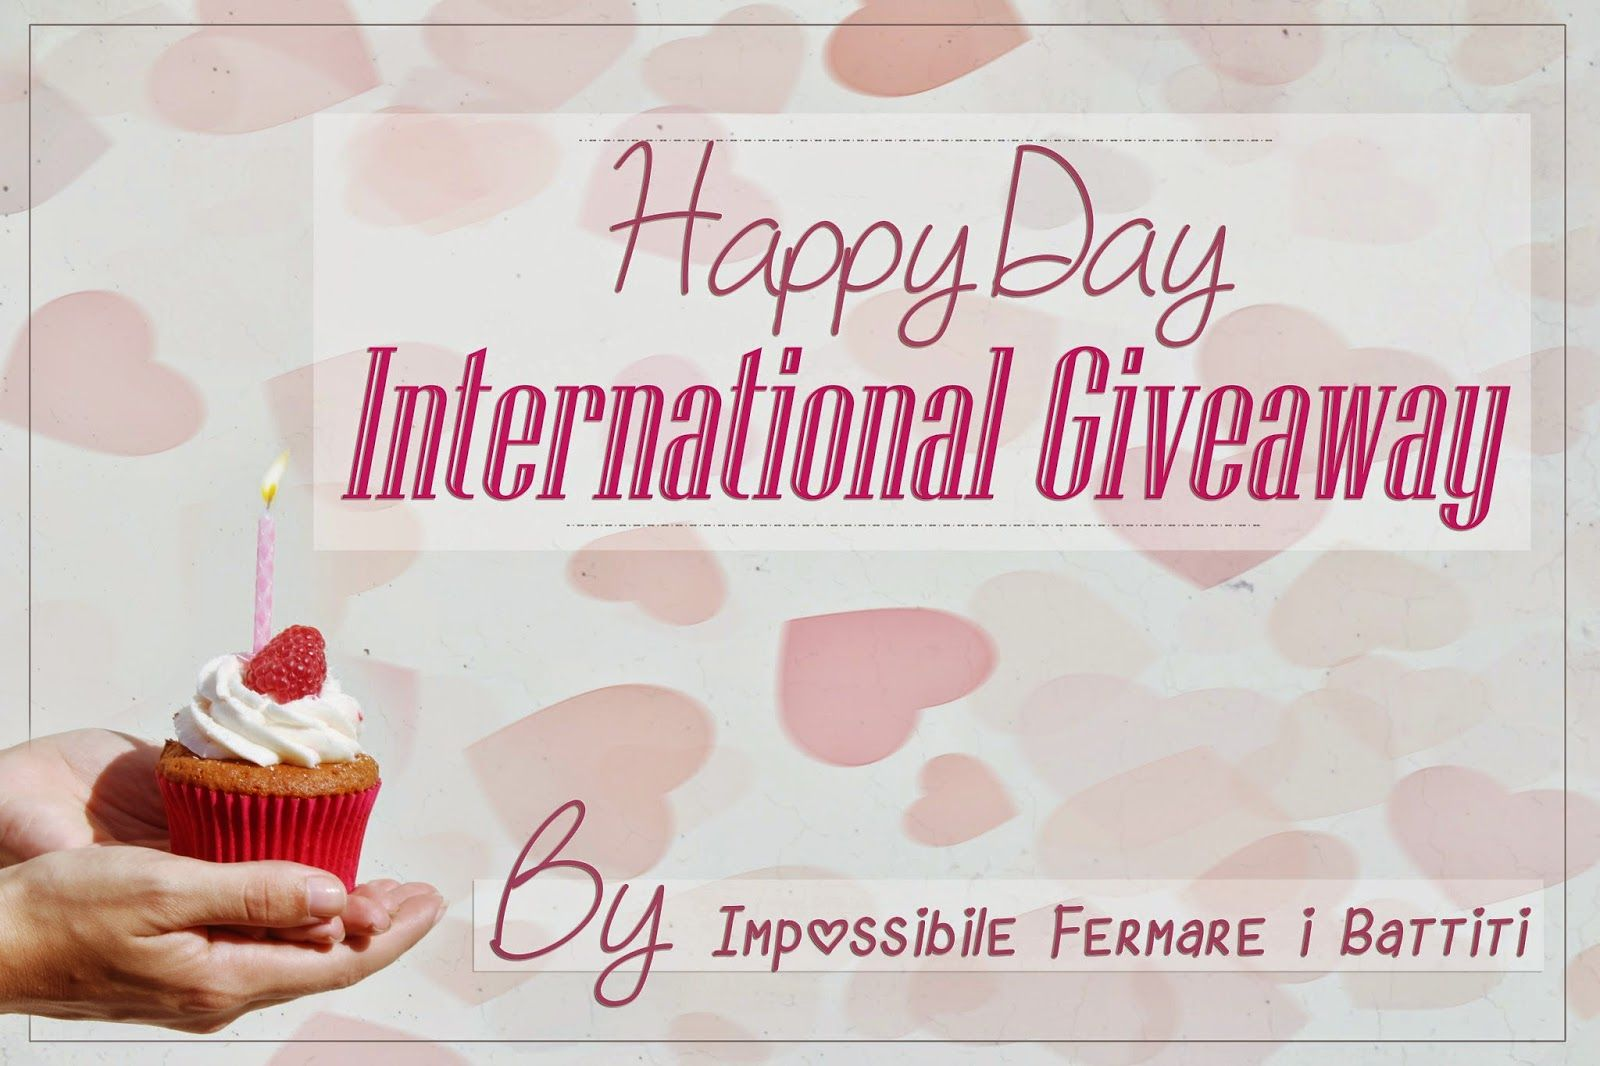 Impossibile fermare i battiti...: Happy Day-international giveaway!